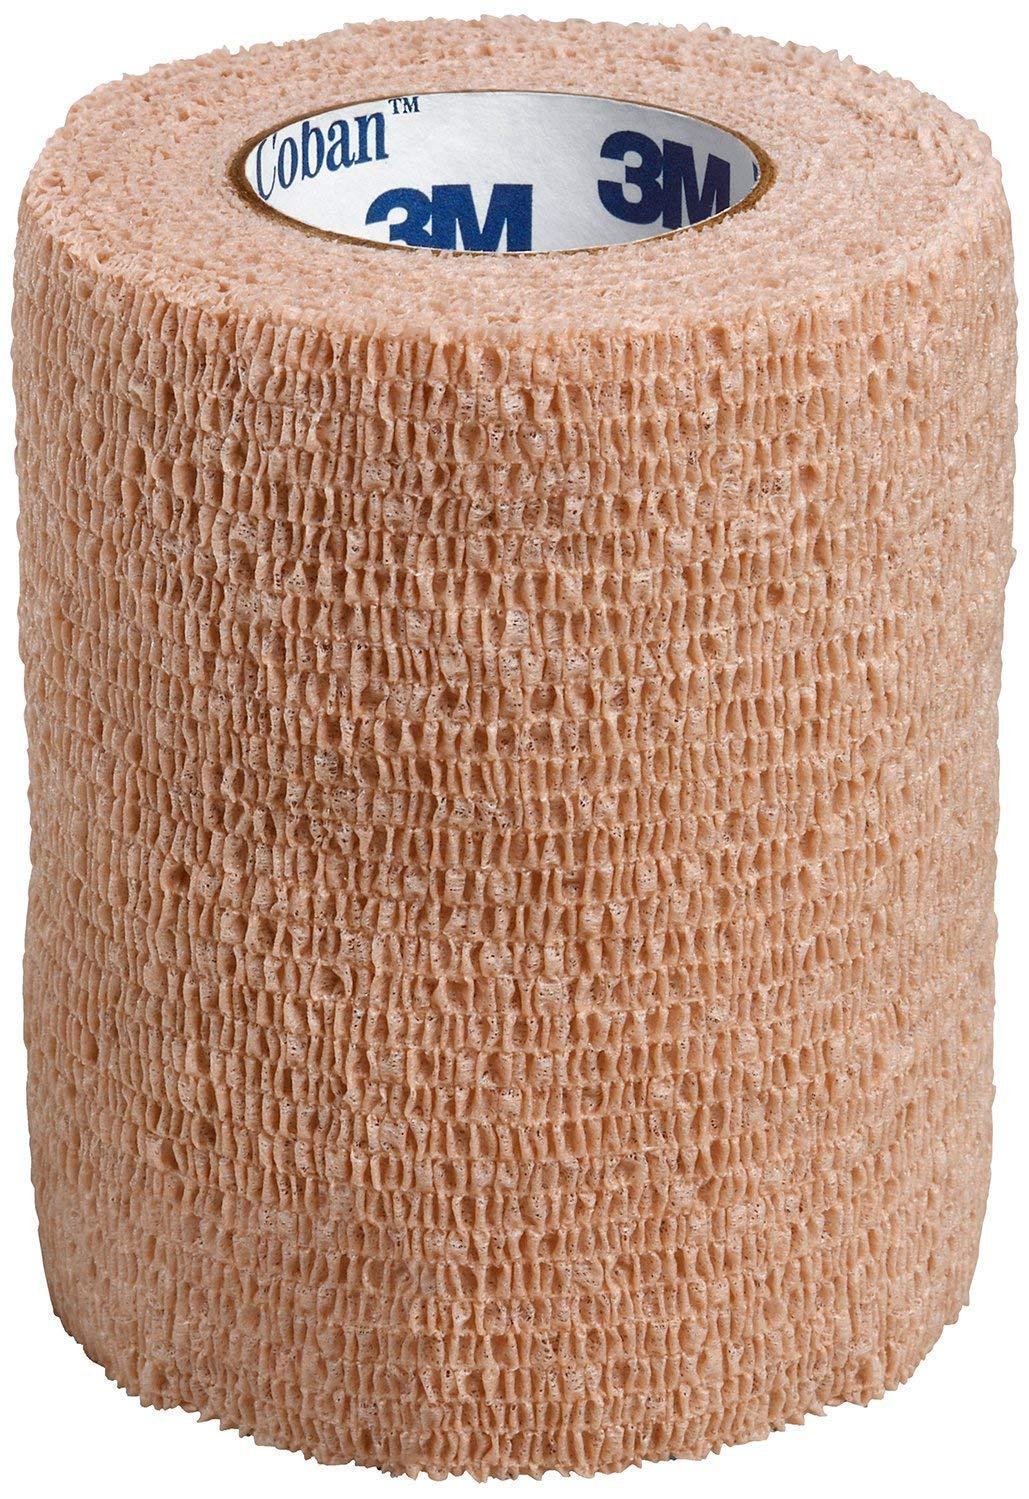 3M Coban Self-Adherent Wrap, Tan, 3''x 5yds, Box of 24 Rolls by 3M C3SD